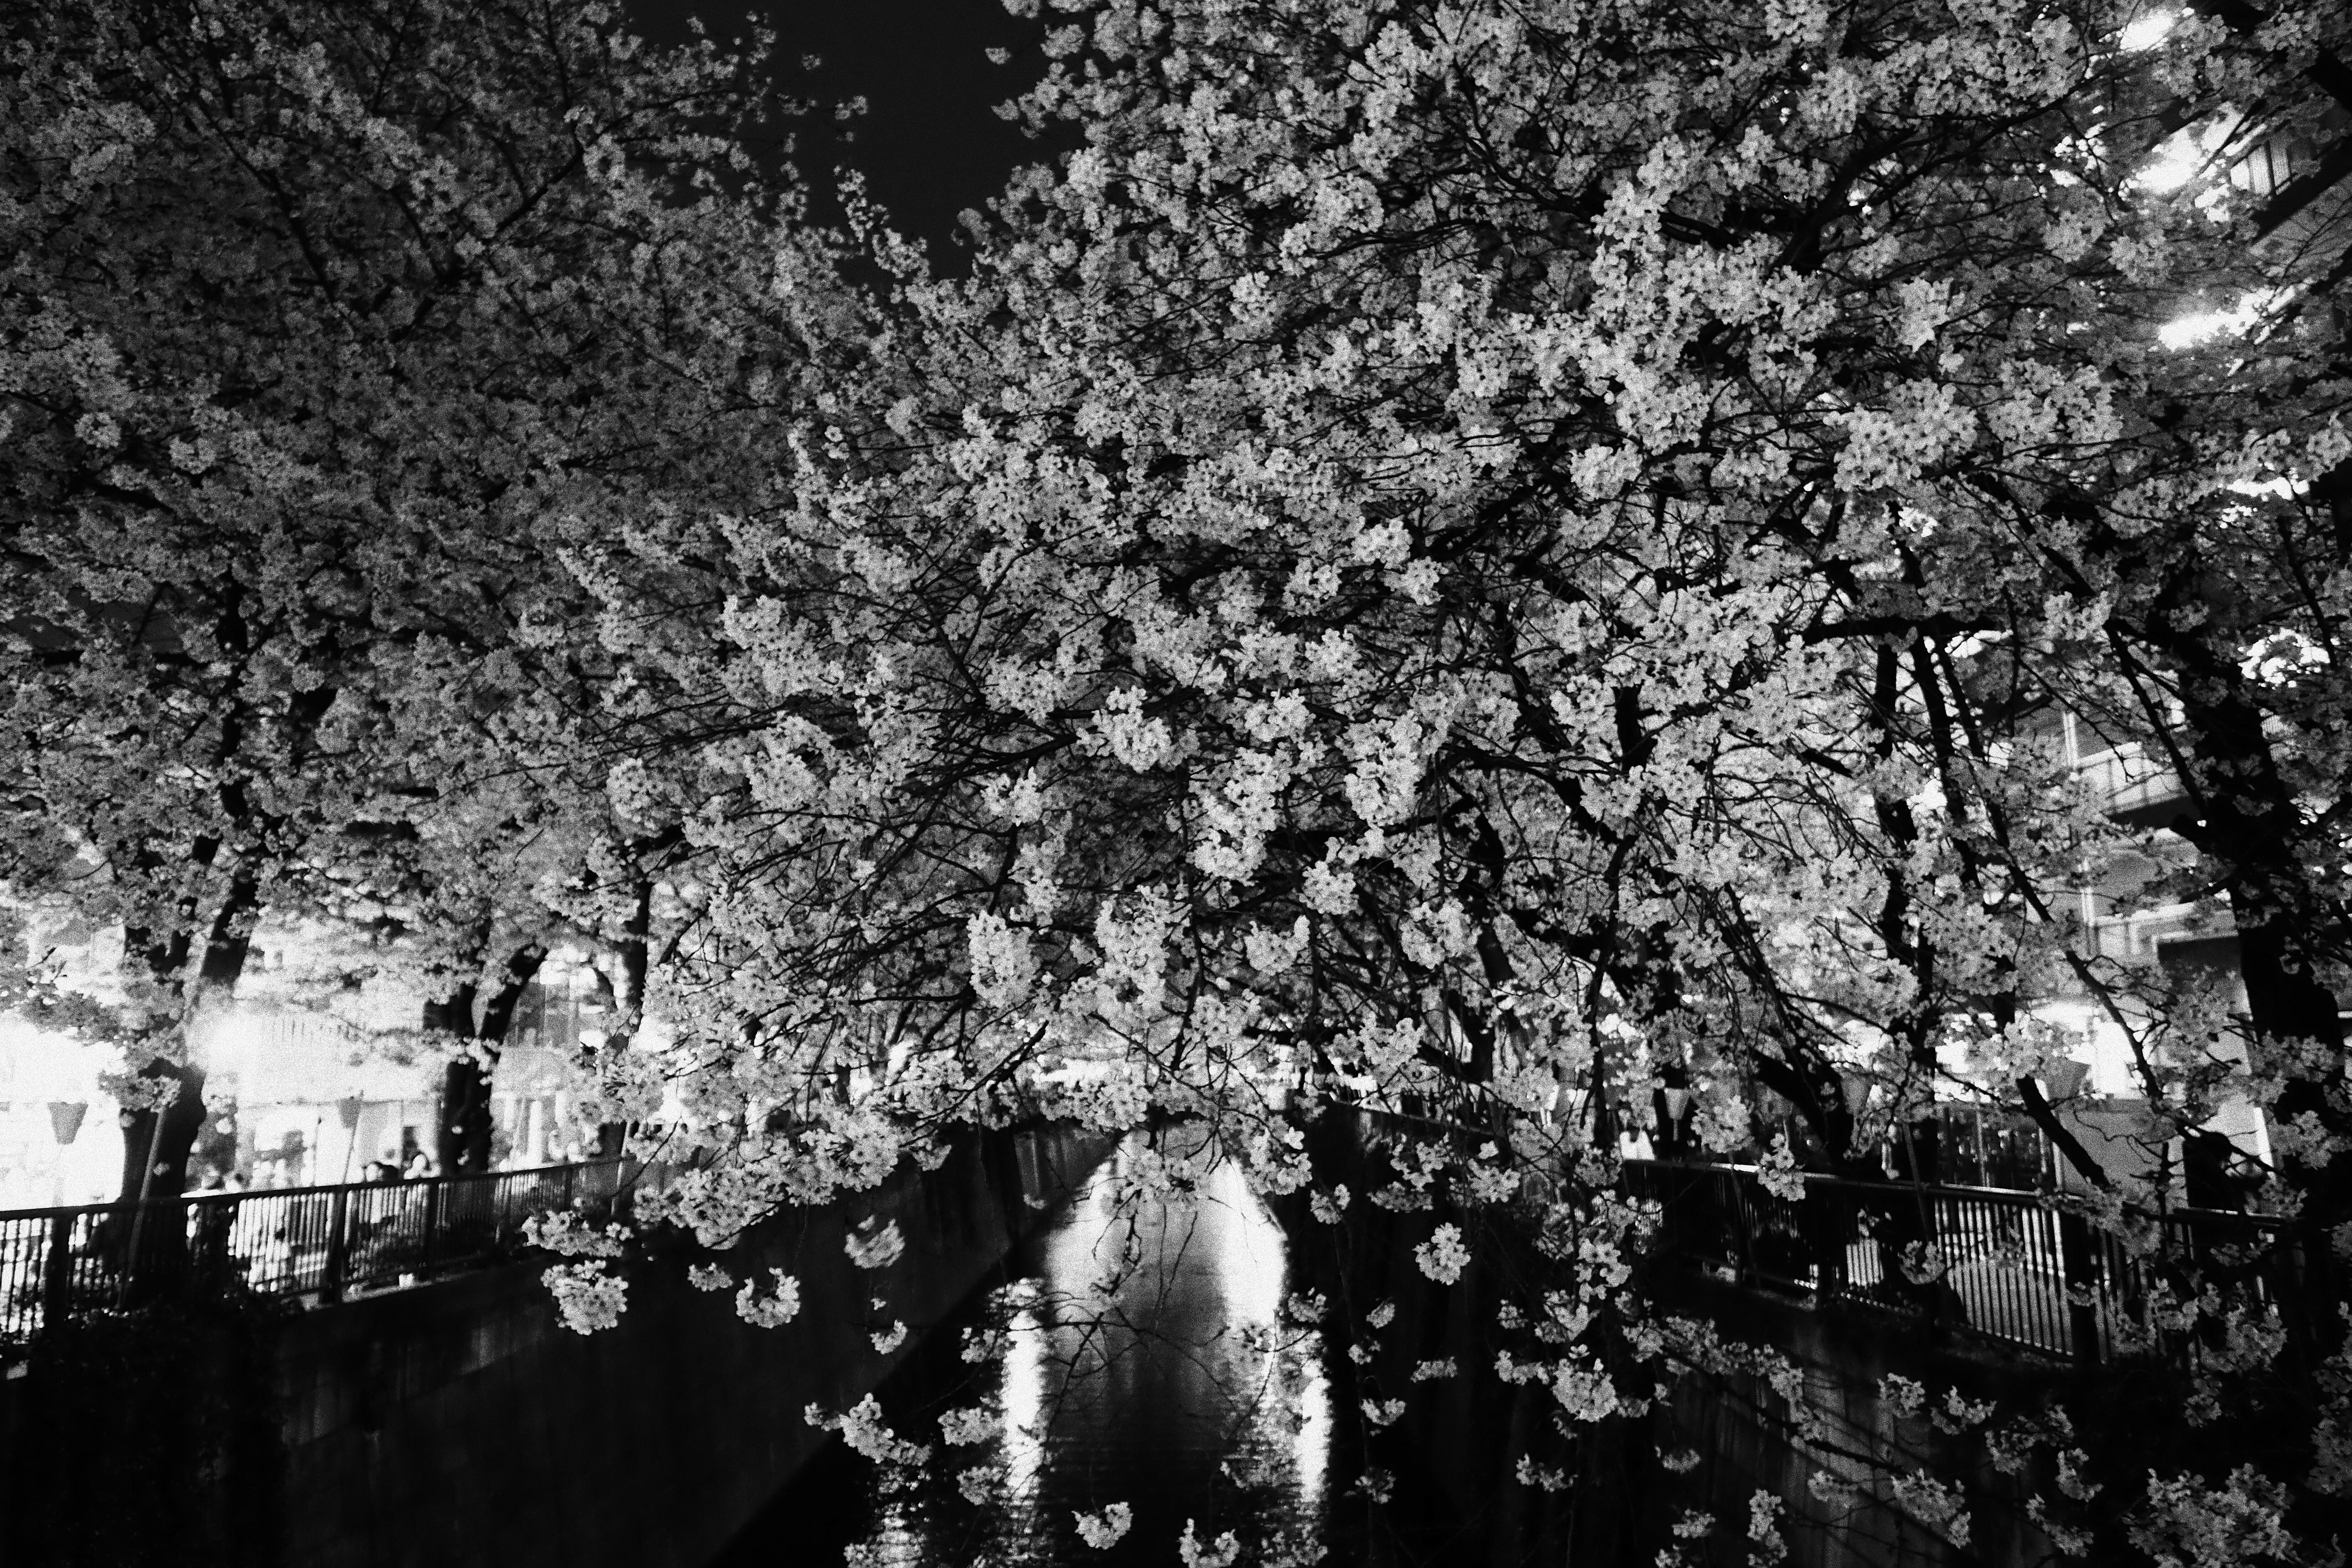 Japan Monochrome Photography Branch Cherry Blossom Pen Spring Tokyo Olympus Jp Tree Flower Plant